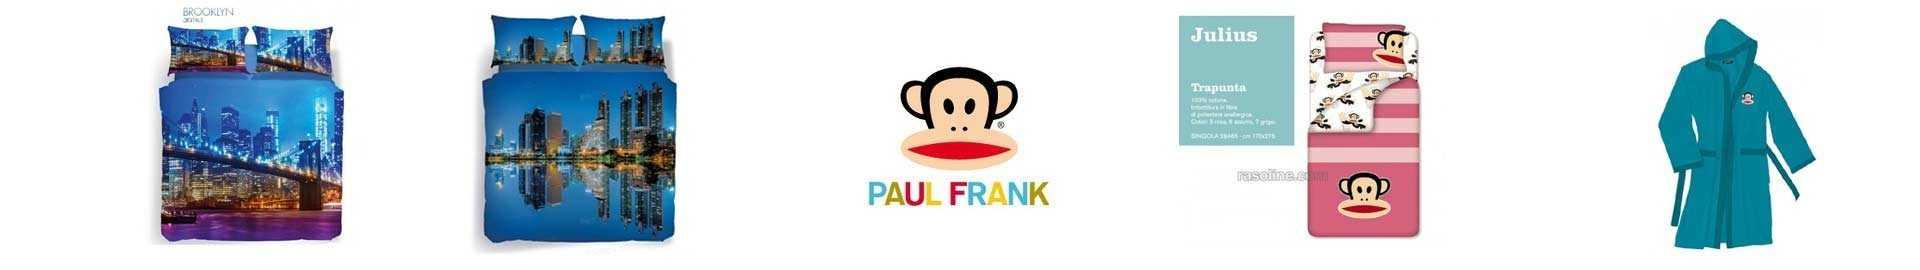 Biancherie per la Casa ! PAUL FRANK